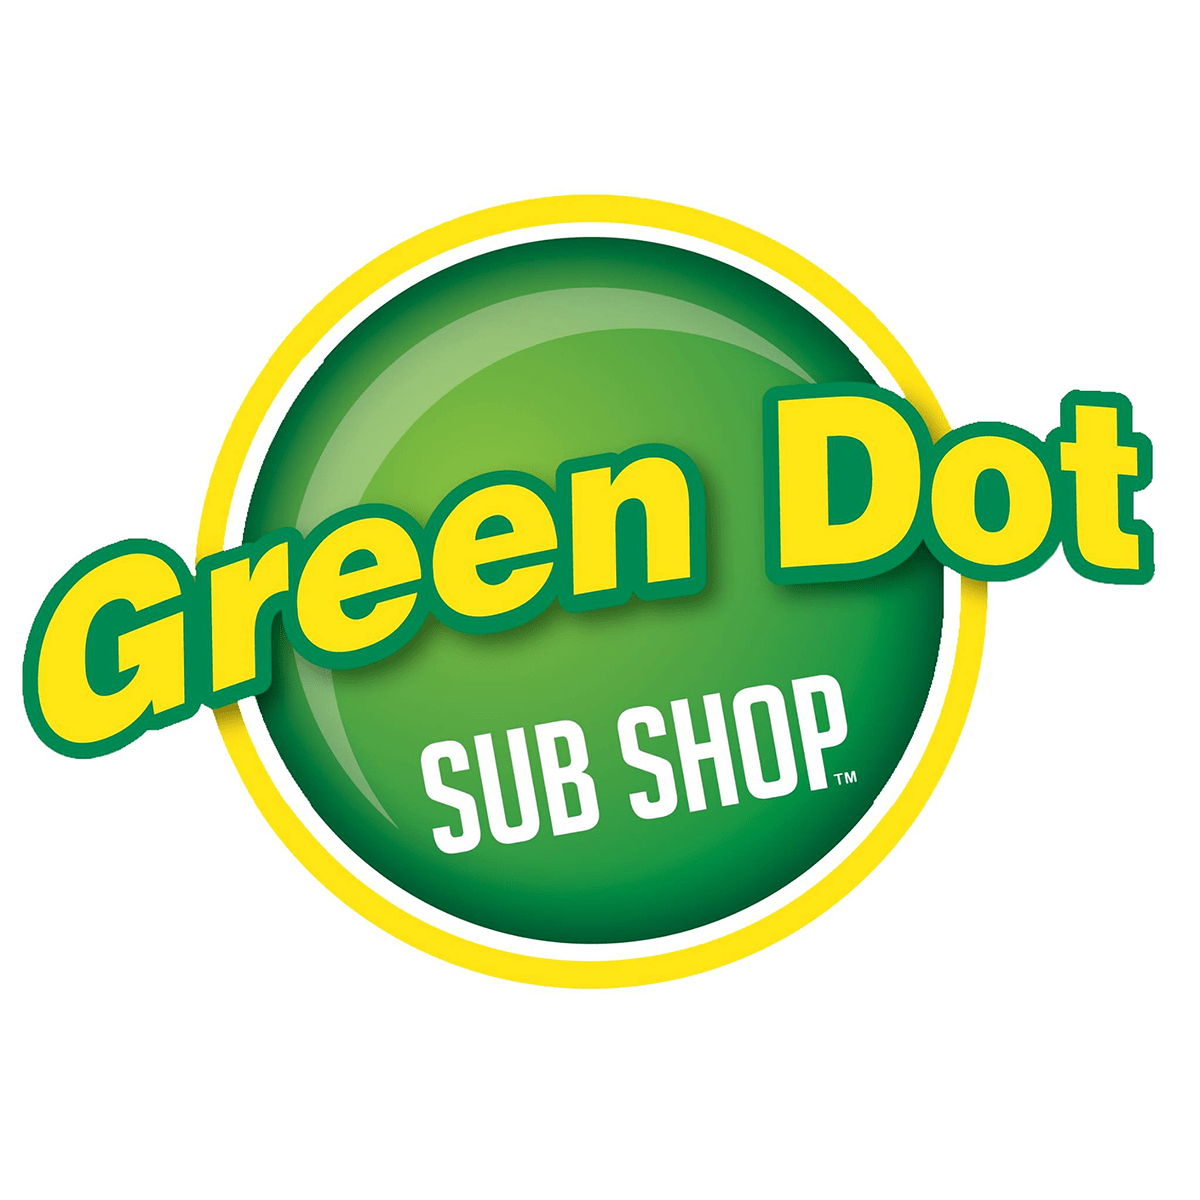 Green Dot Sub Shop logo